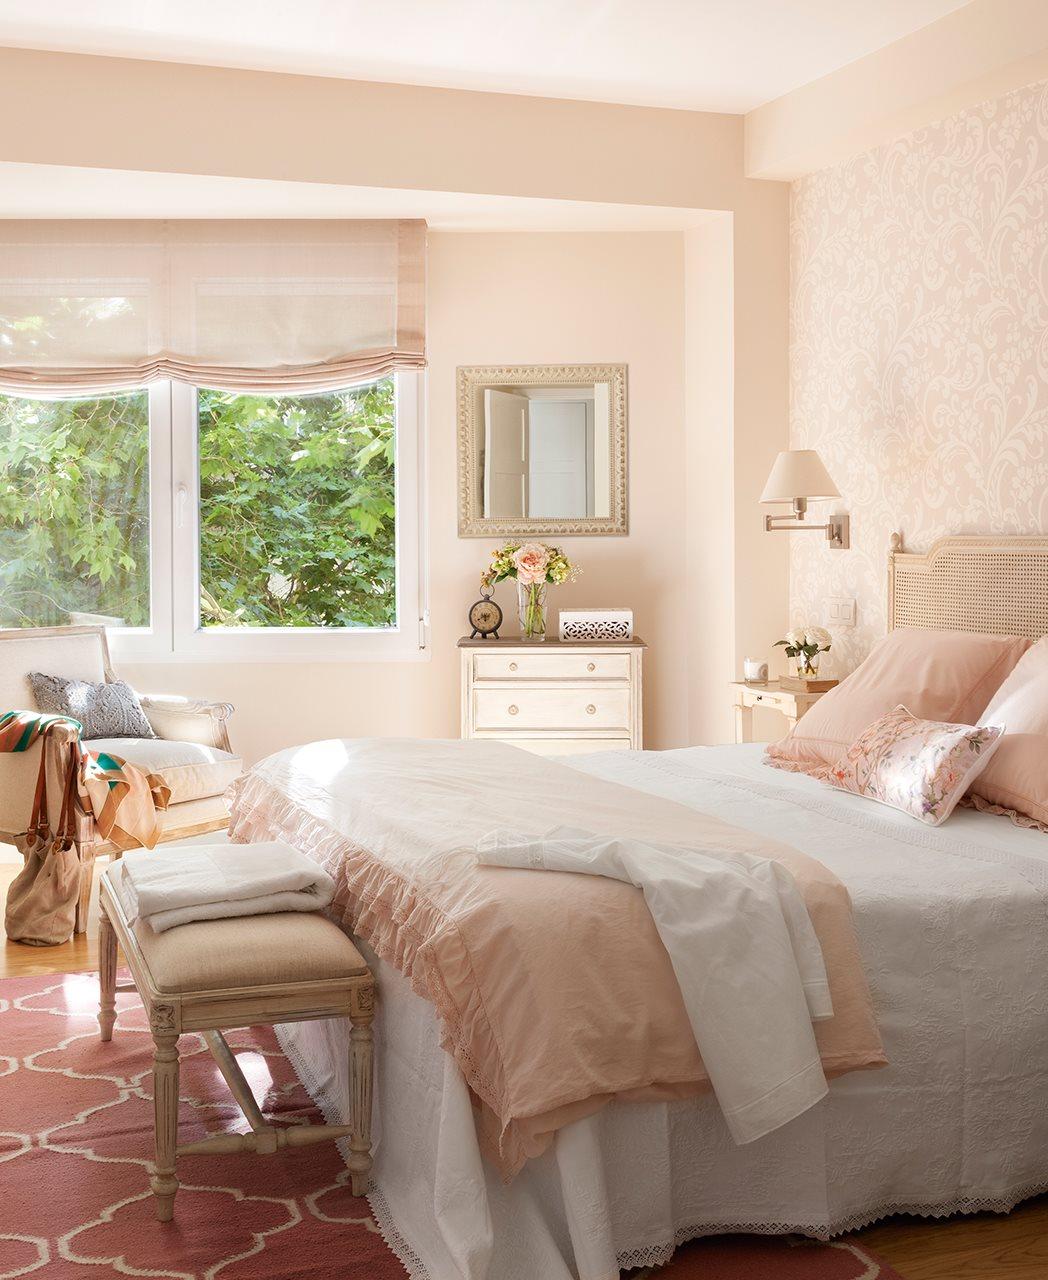 5 ideas para decorar dormitorios dise o dormitorios - Blog decoracion dormitorios ...